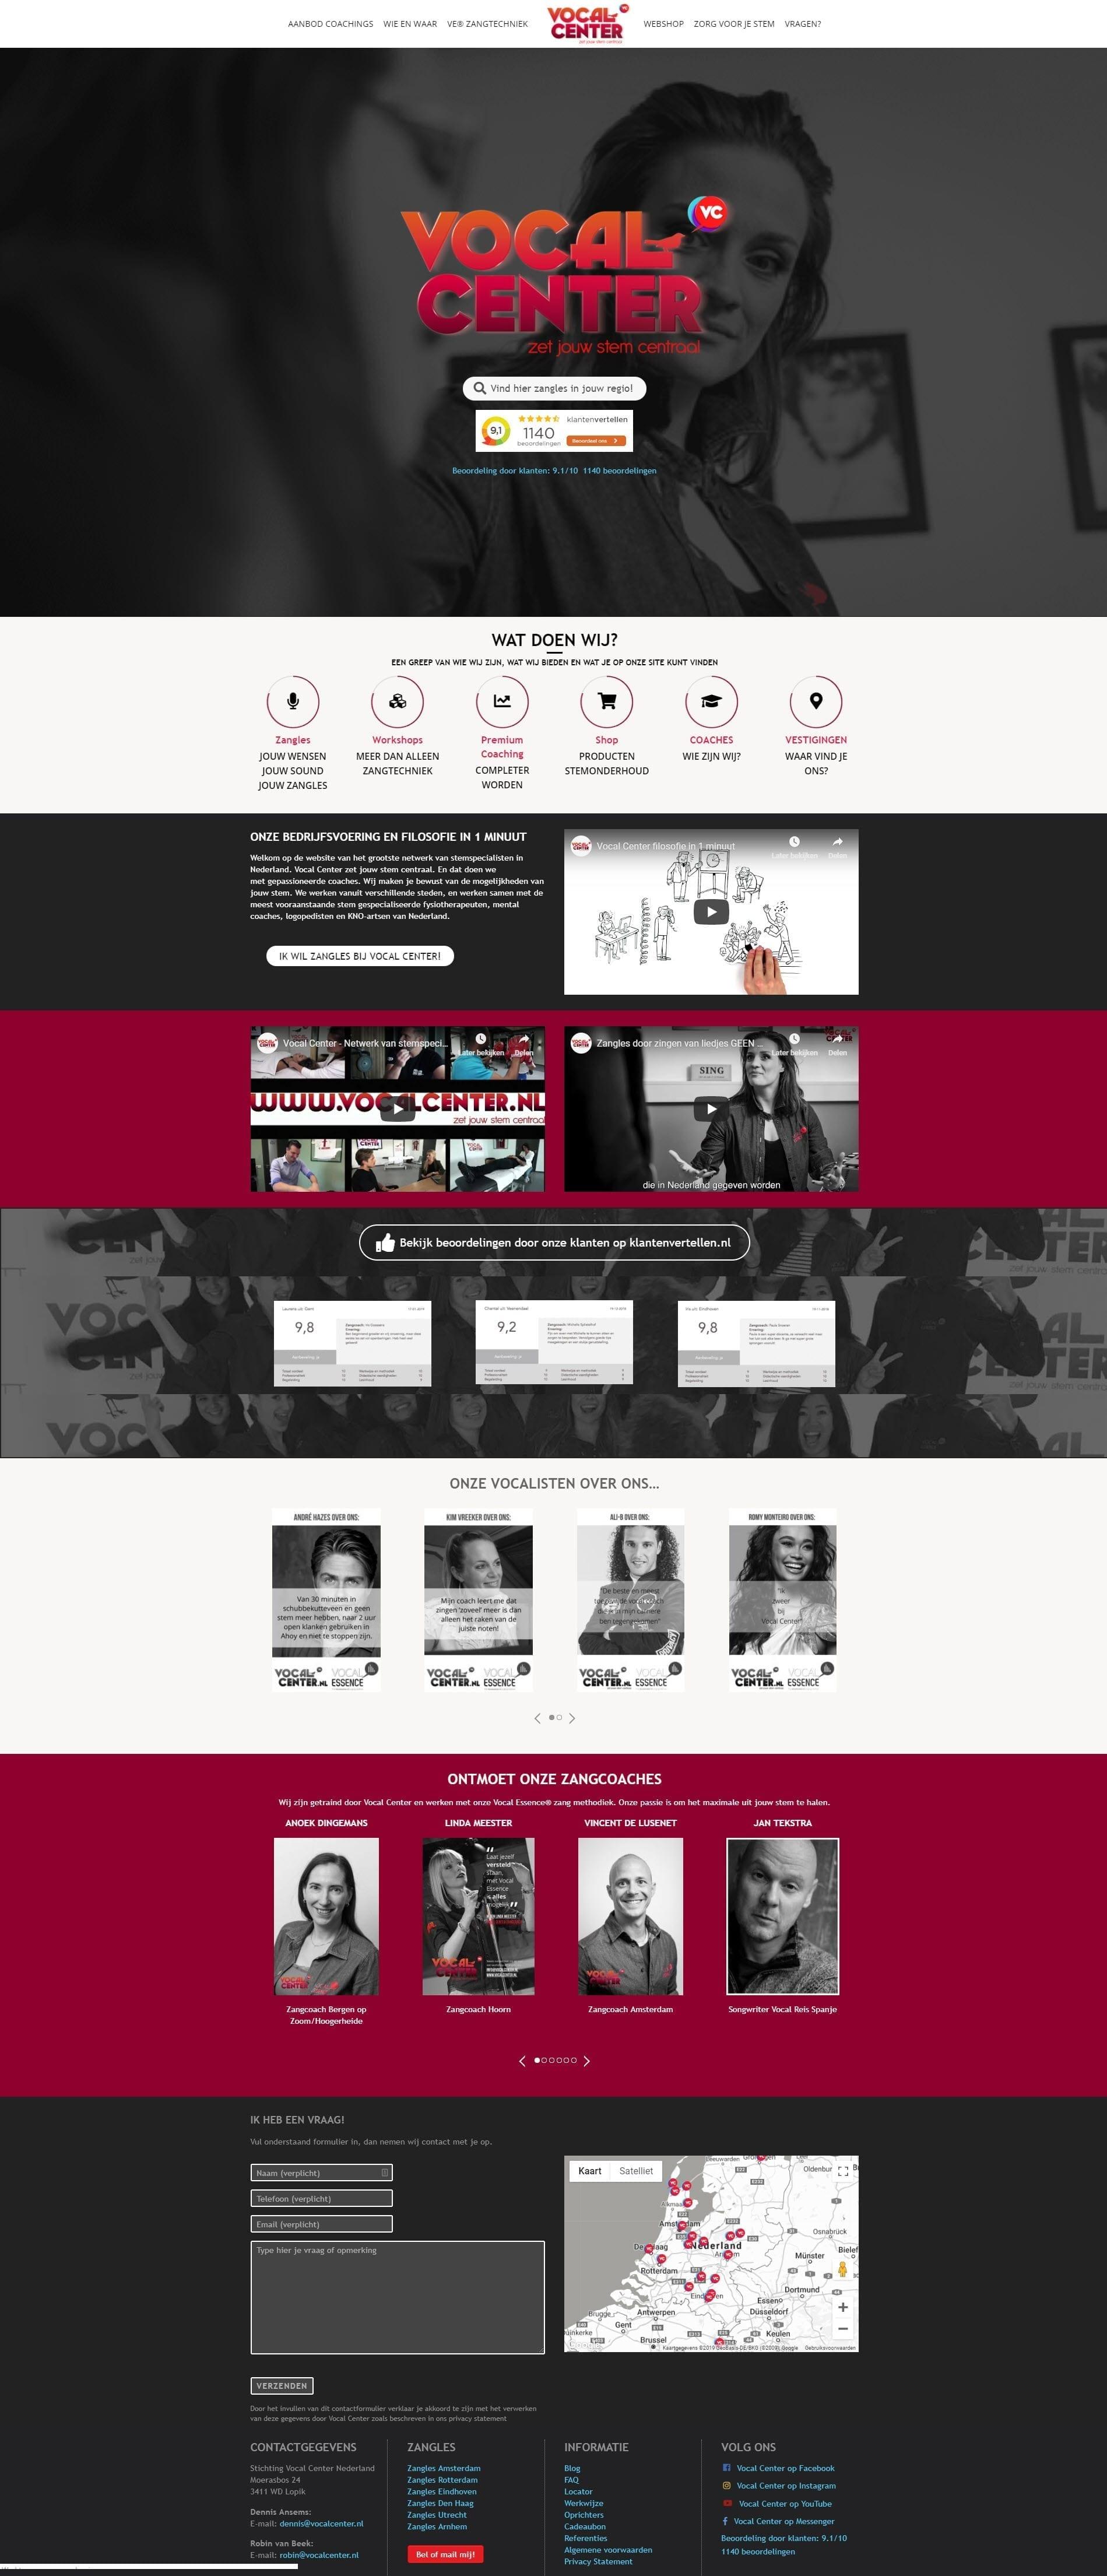 Website Vocalcenter.nl